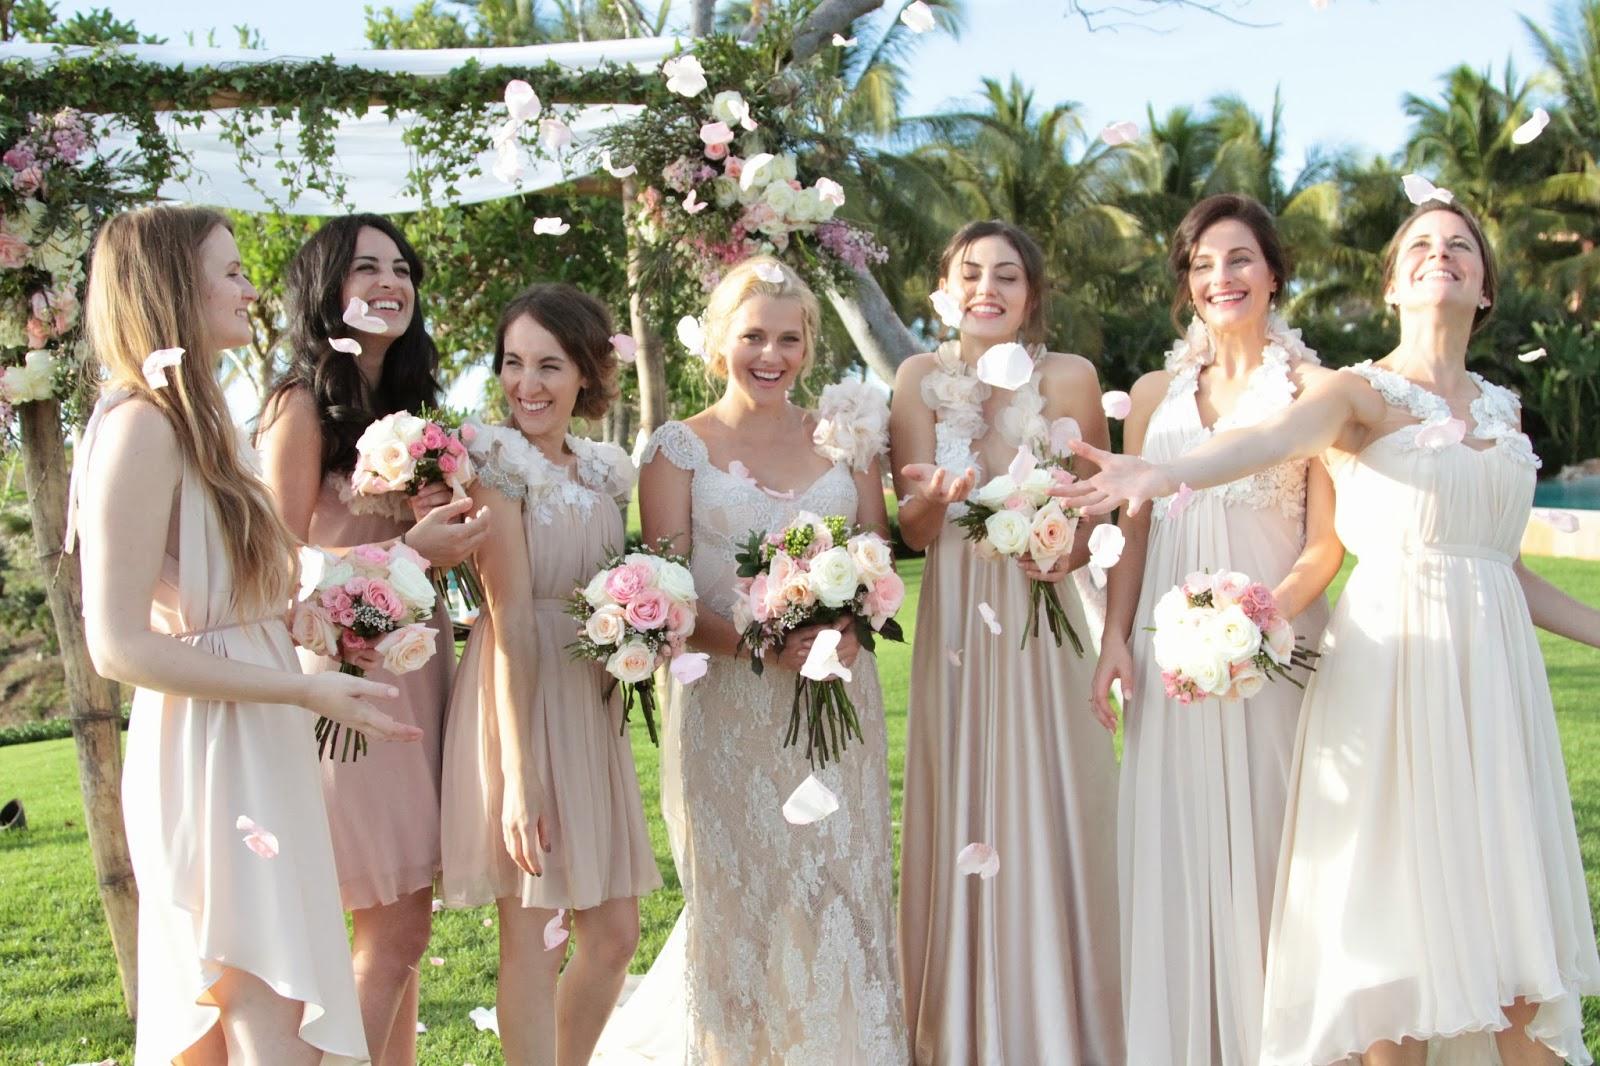 Phoebe singer wedding